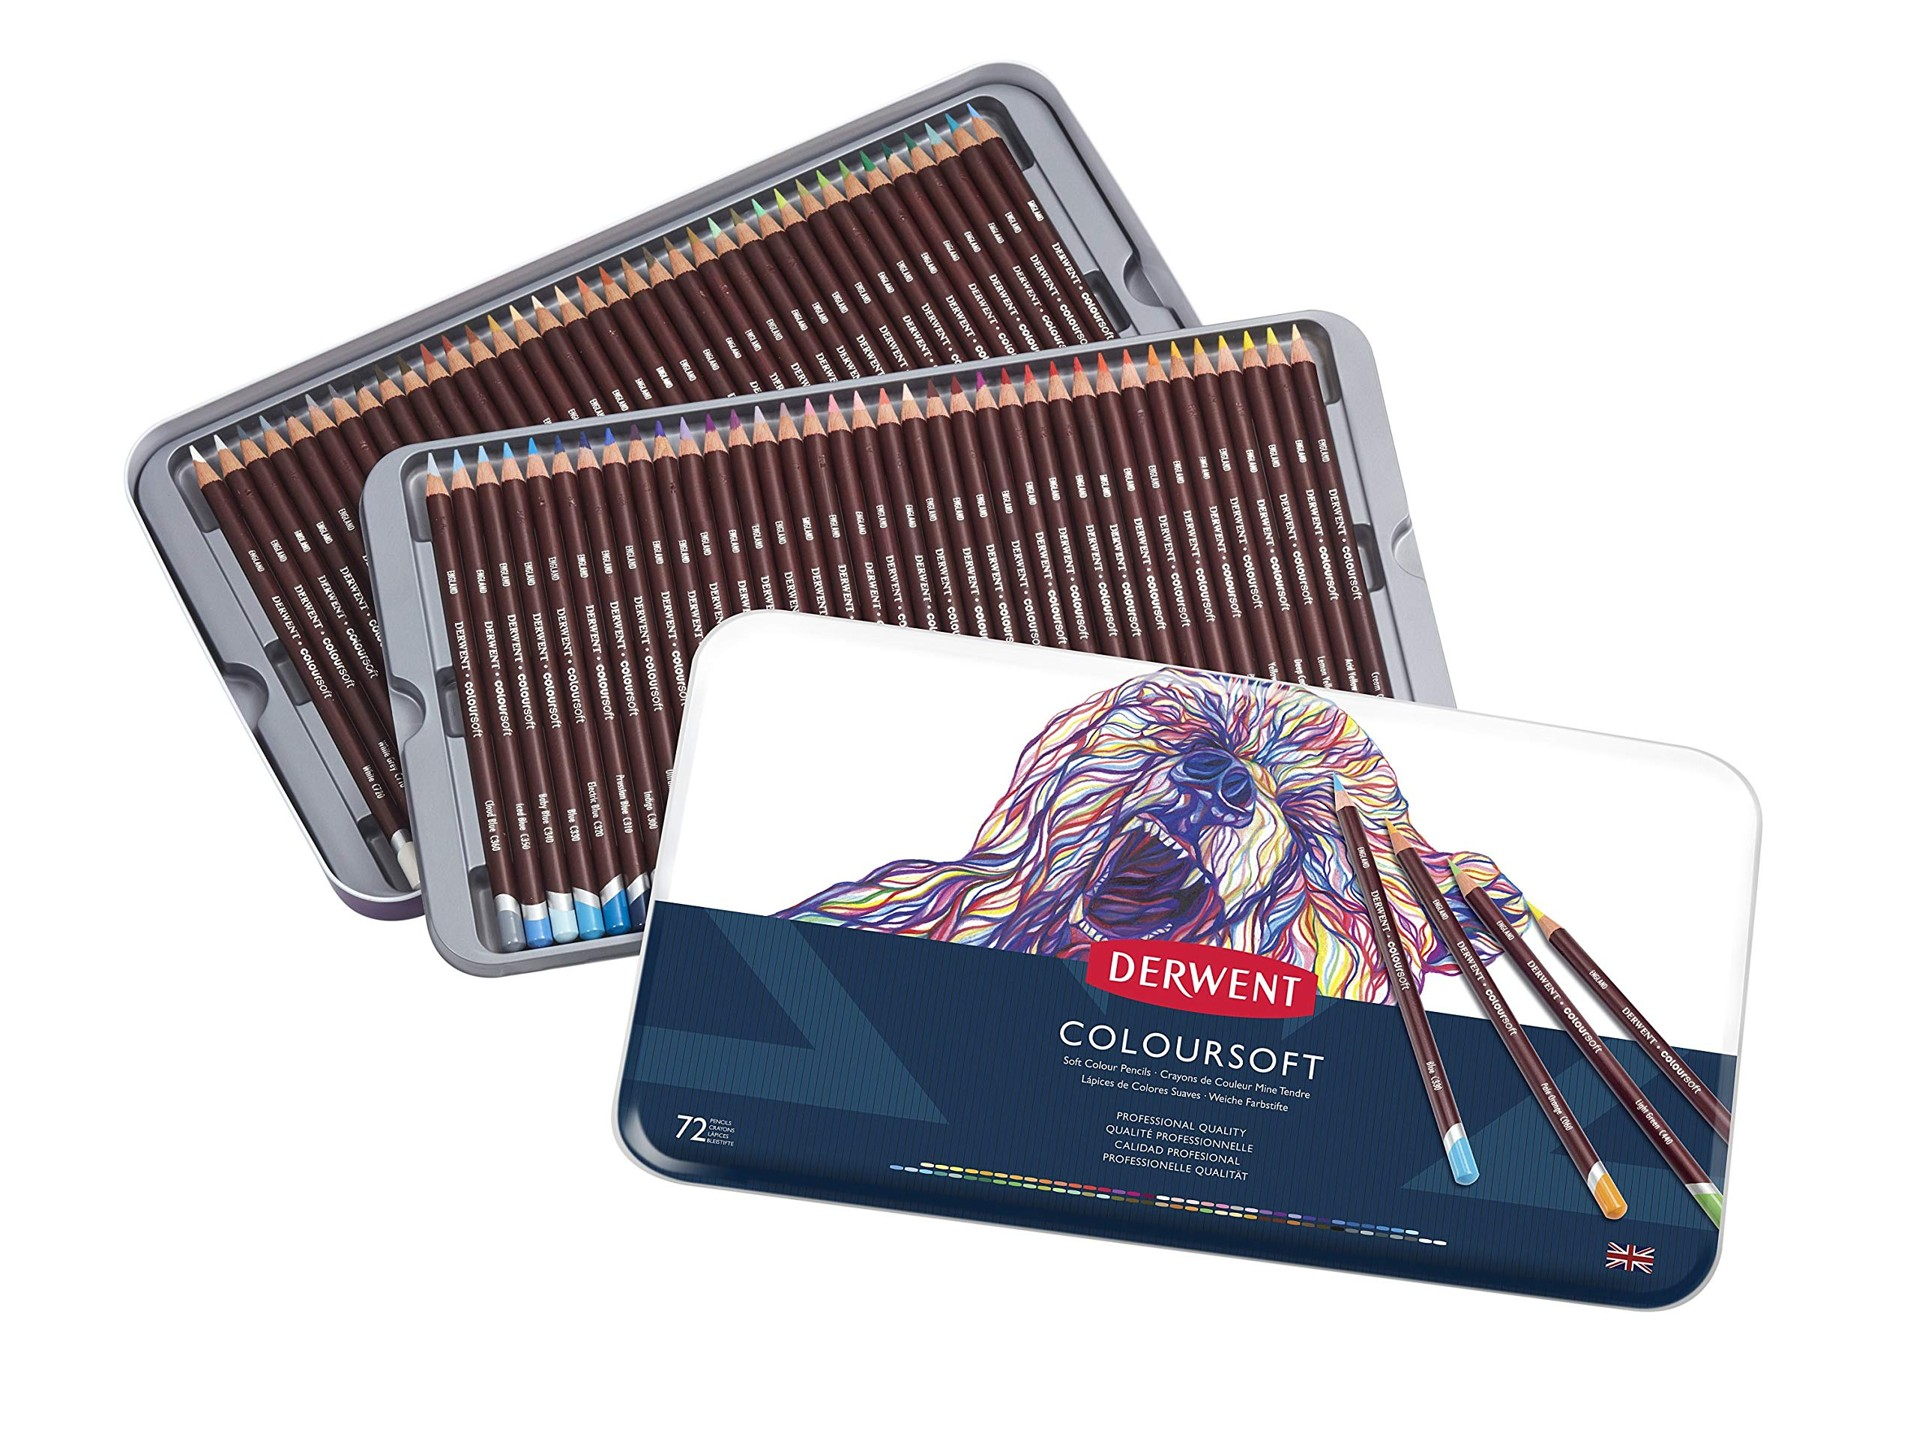 Derwent - Coloursoft Pencils, 72 Tin